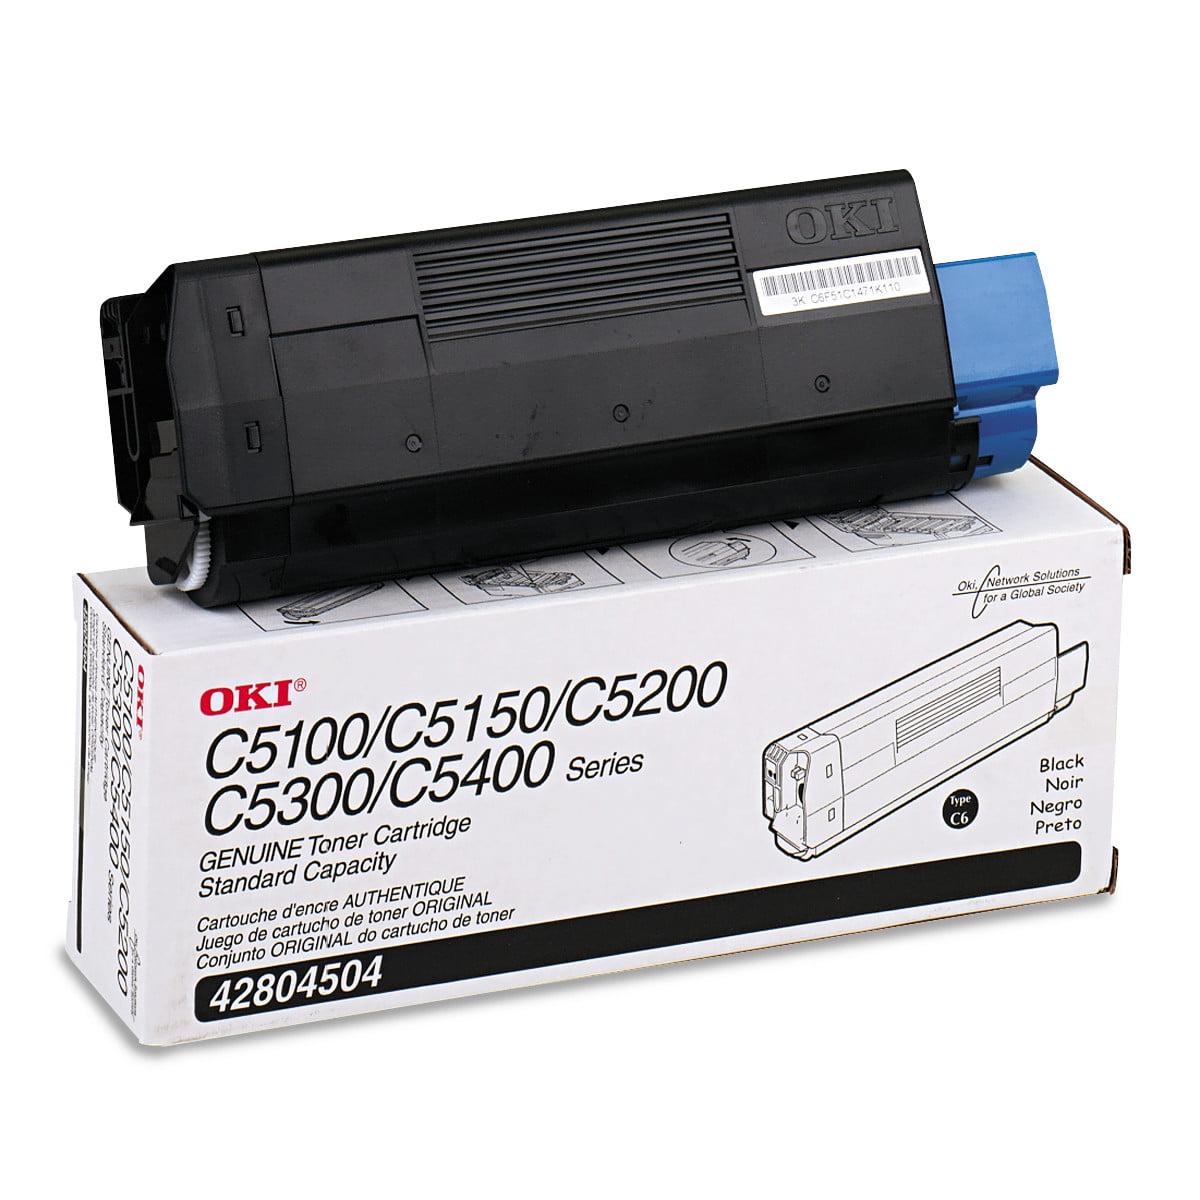 Oki 42804504 Toner (Type C6), 3000 Page-Yield, Black